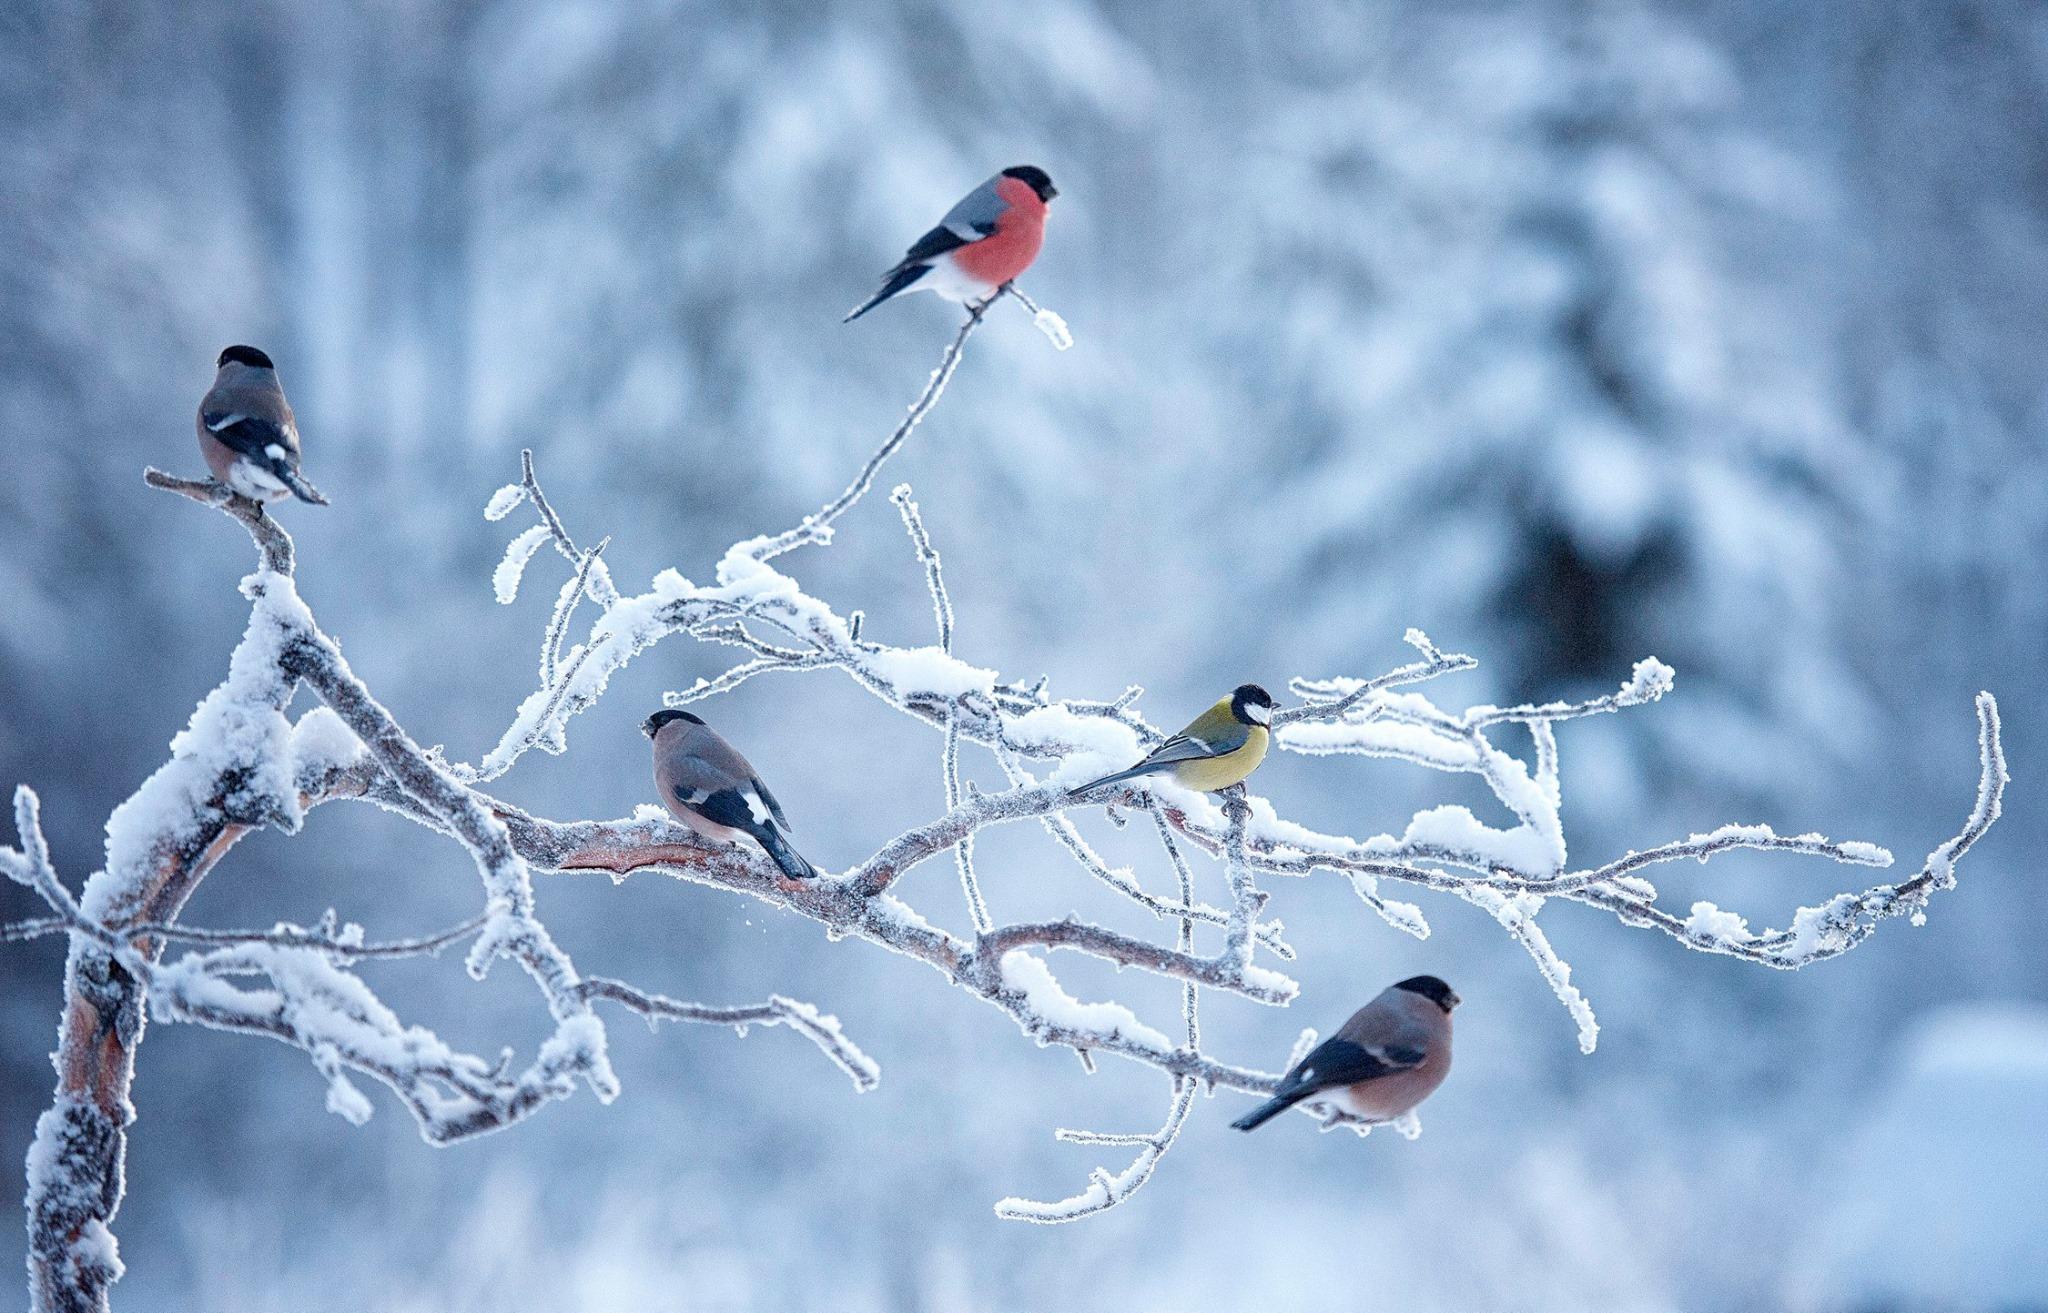 File:Winter bird.jpg - Wikimedia Commons